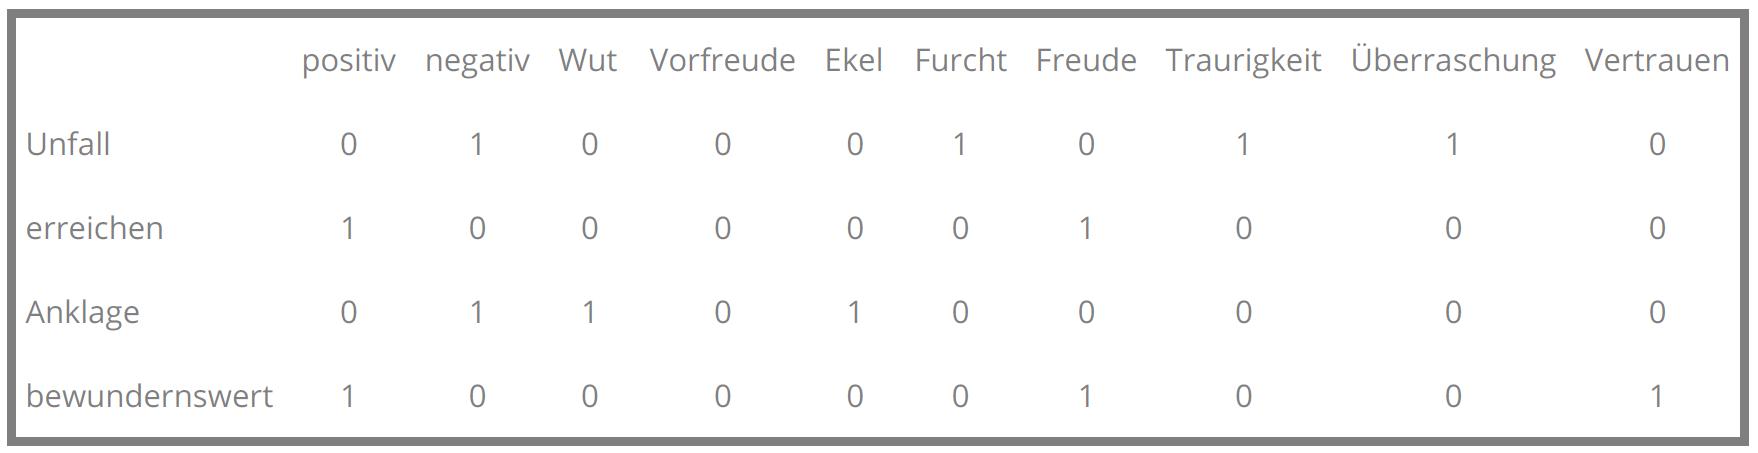 Tabelle Sentiment Lexikon